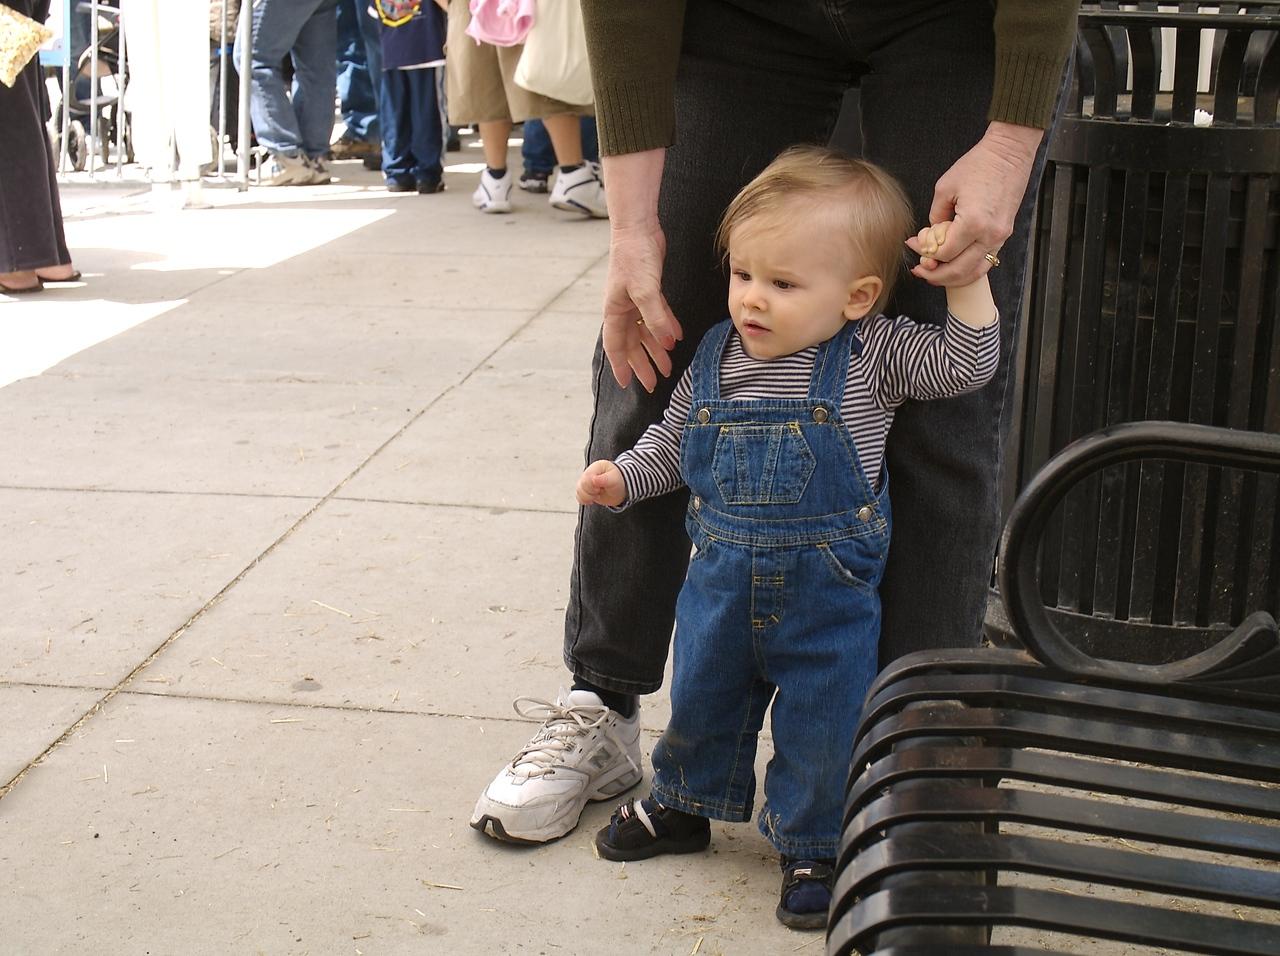 Cody and grandma jan go for a stroll.